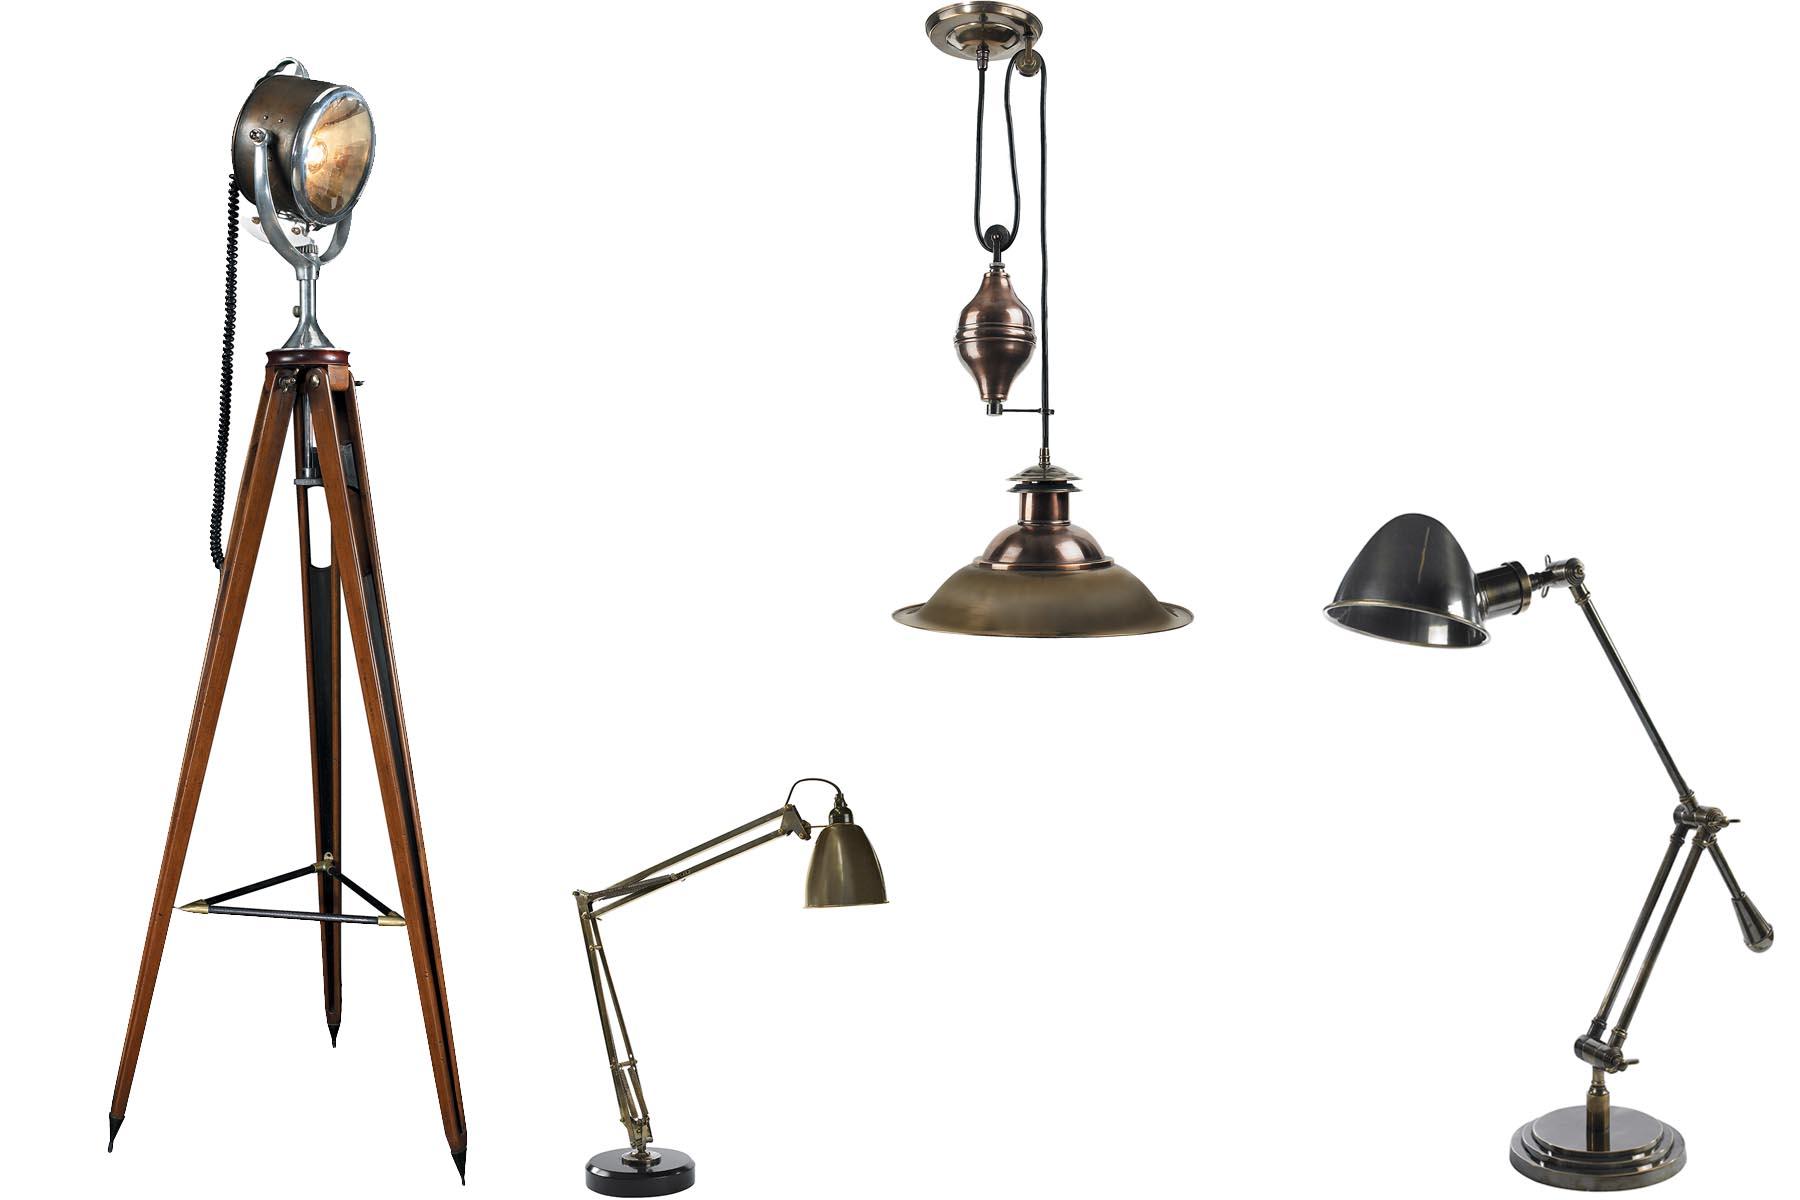 lampe de bureau cuir et laiton. Black Bedroom Furniture Sets. Home Design Ideas